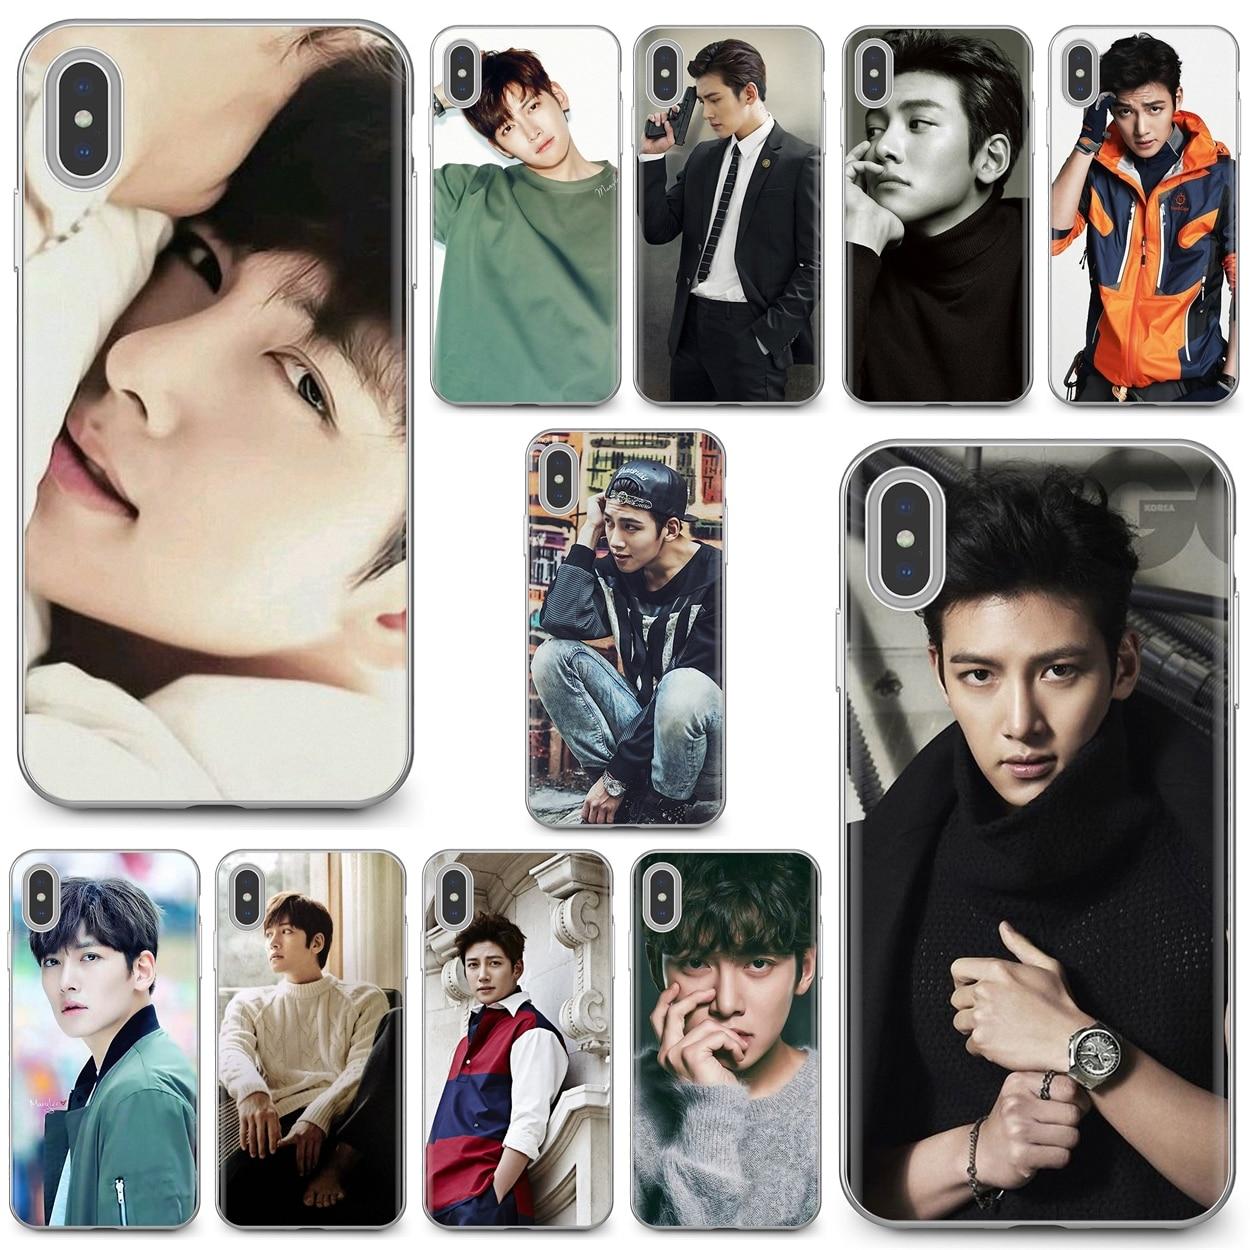 Slim Silicone Soft TPU Phone Case For Motorola Moto G G2 G3 X4 E4 E5 G5 G5S G6 Z Z2 Z3 C Play Plus Ji Chang Wook Korean Actor